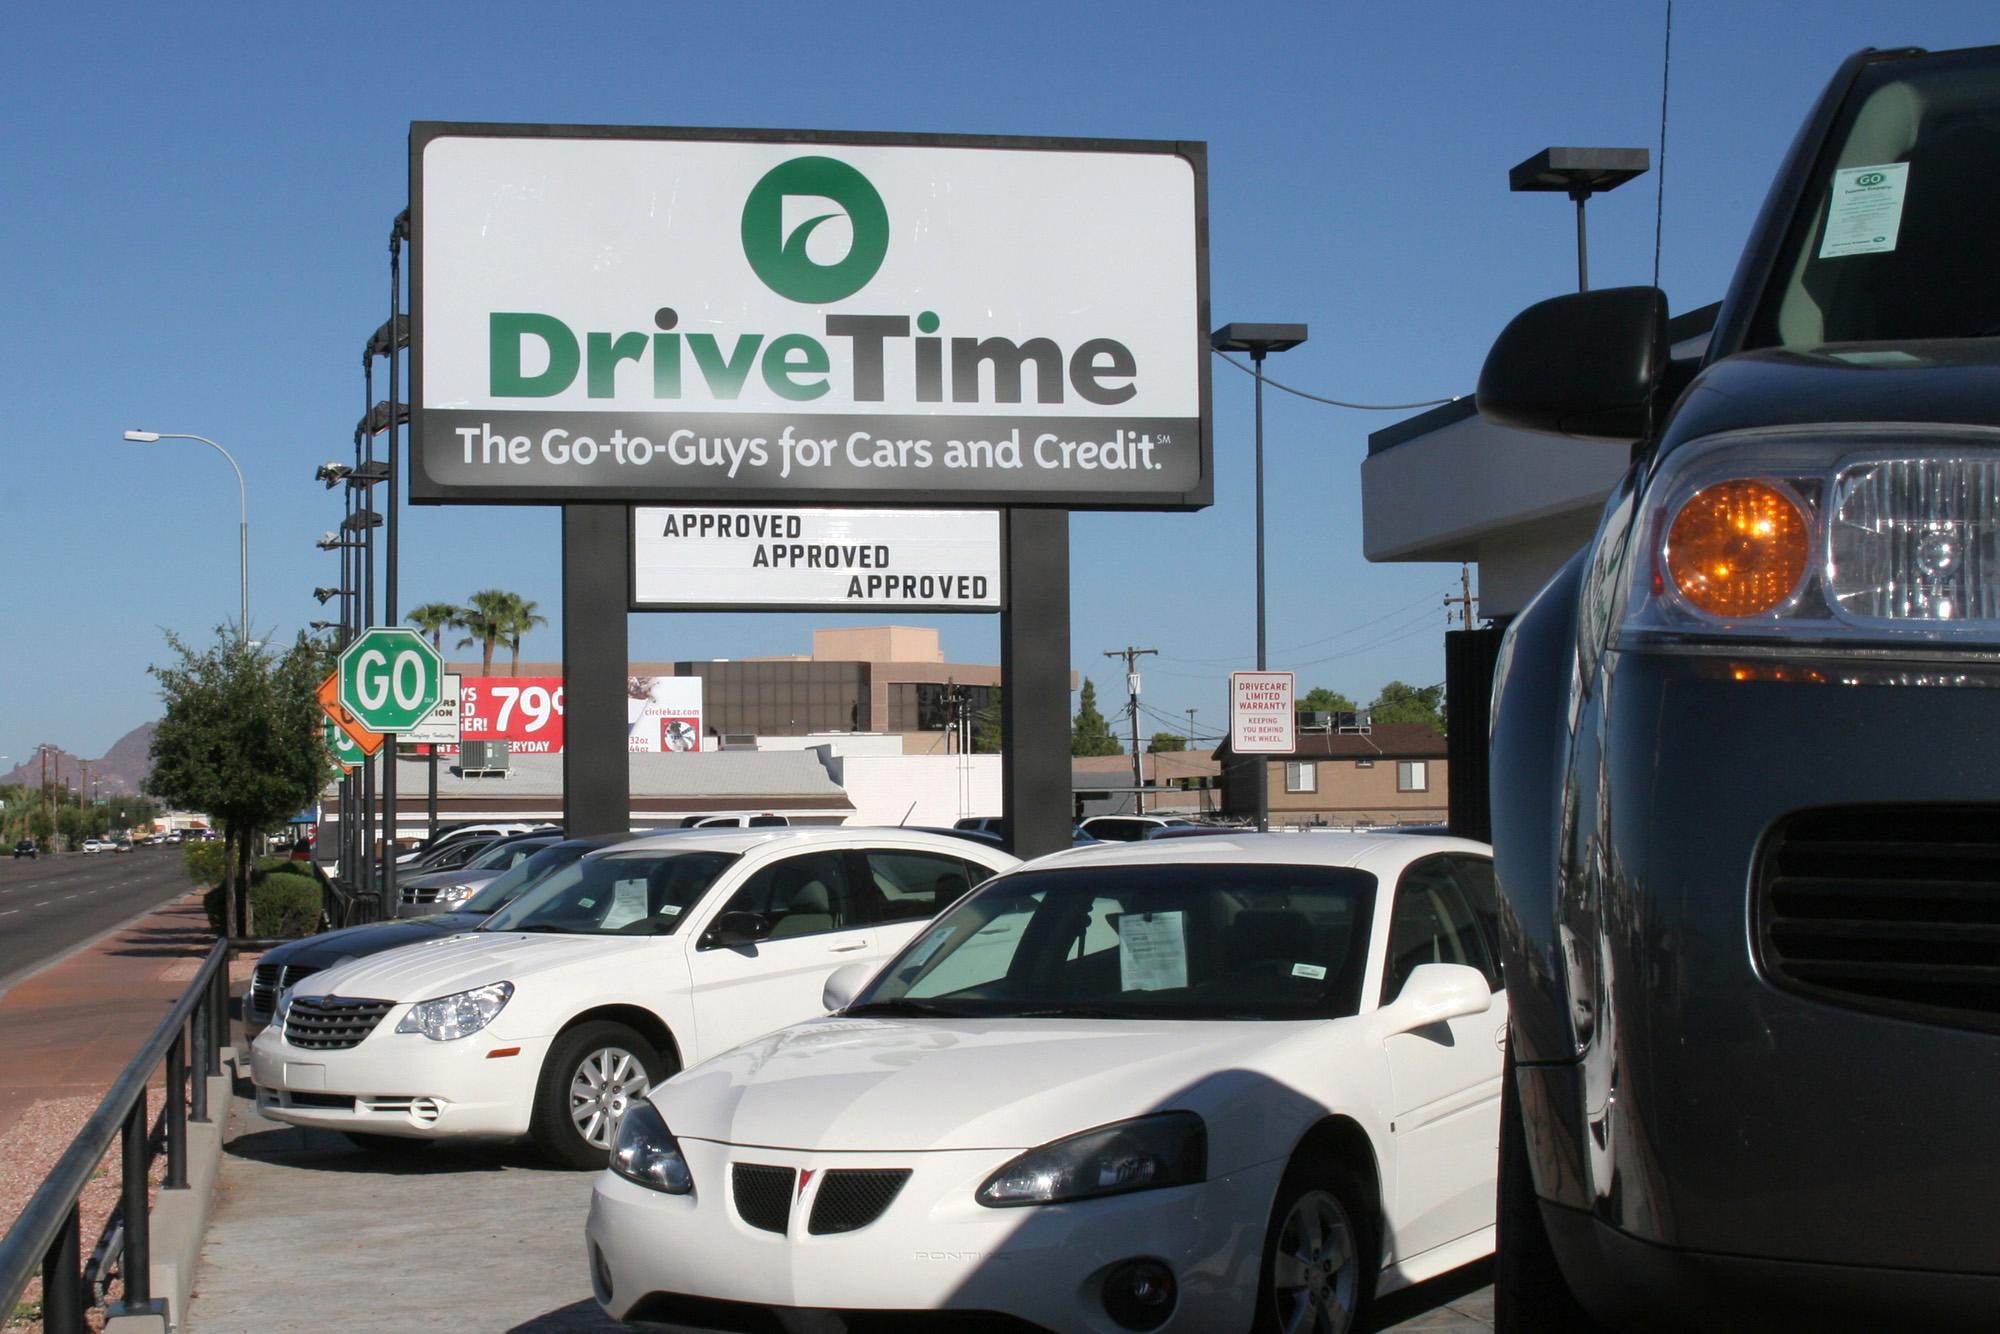 Used Car Public Companies